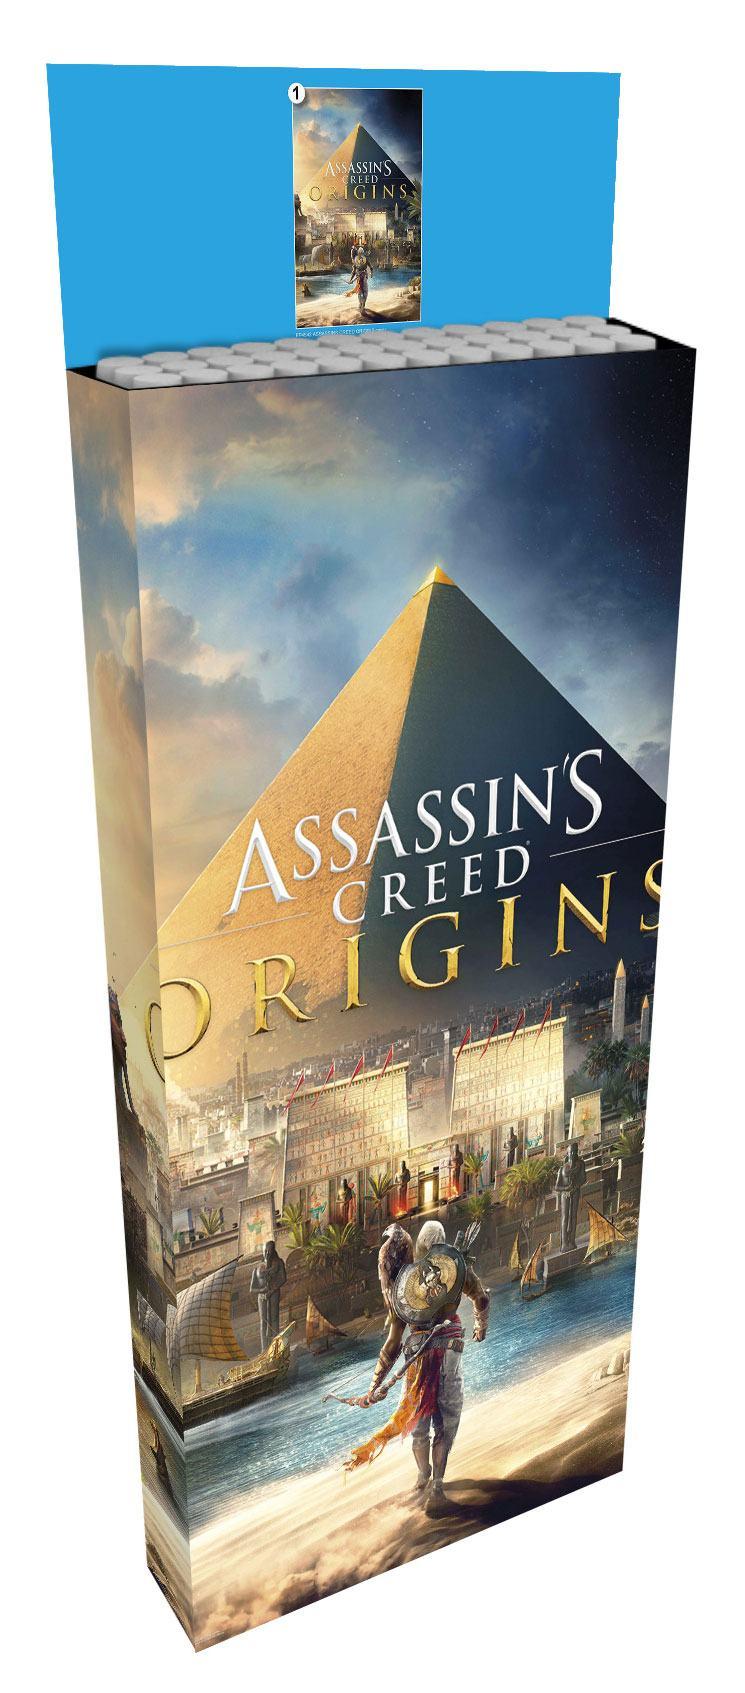 Assassin's Creed Origins Poster 61 x 91 cm Display (35)